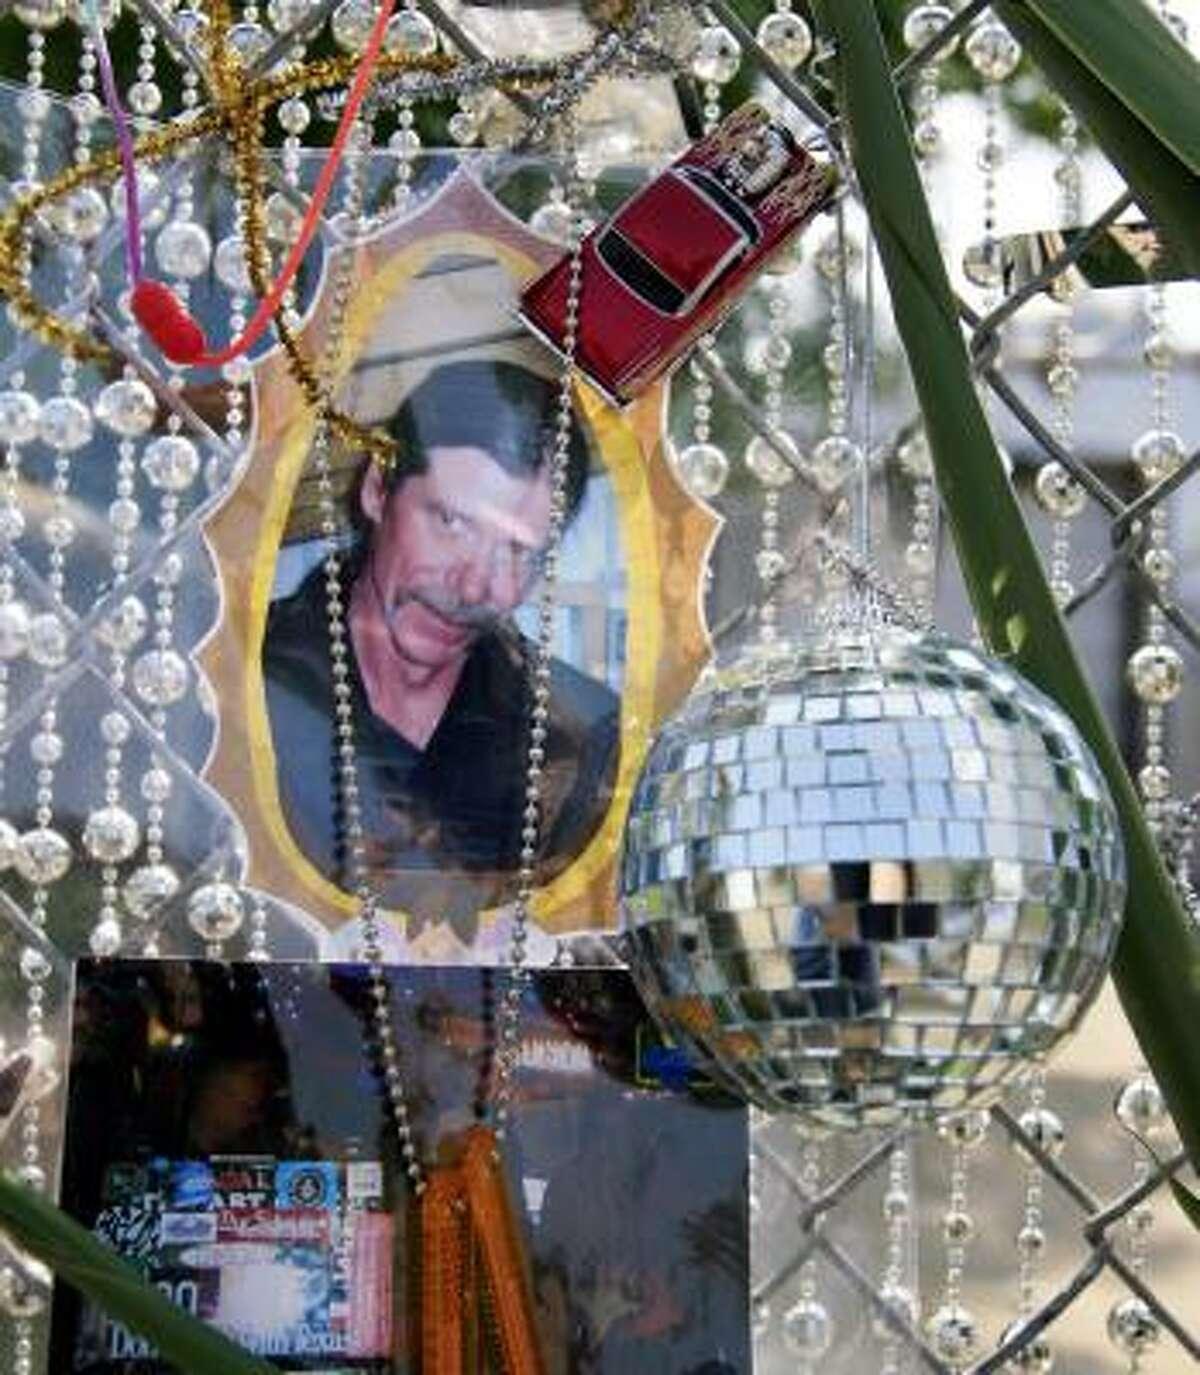 A tribute to Tom Jones hangs outside the Art Car Museum.